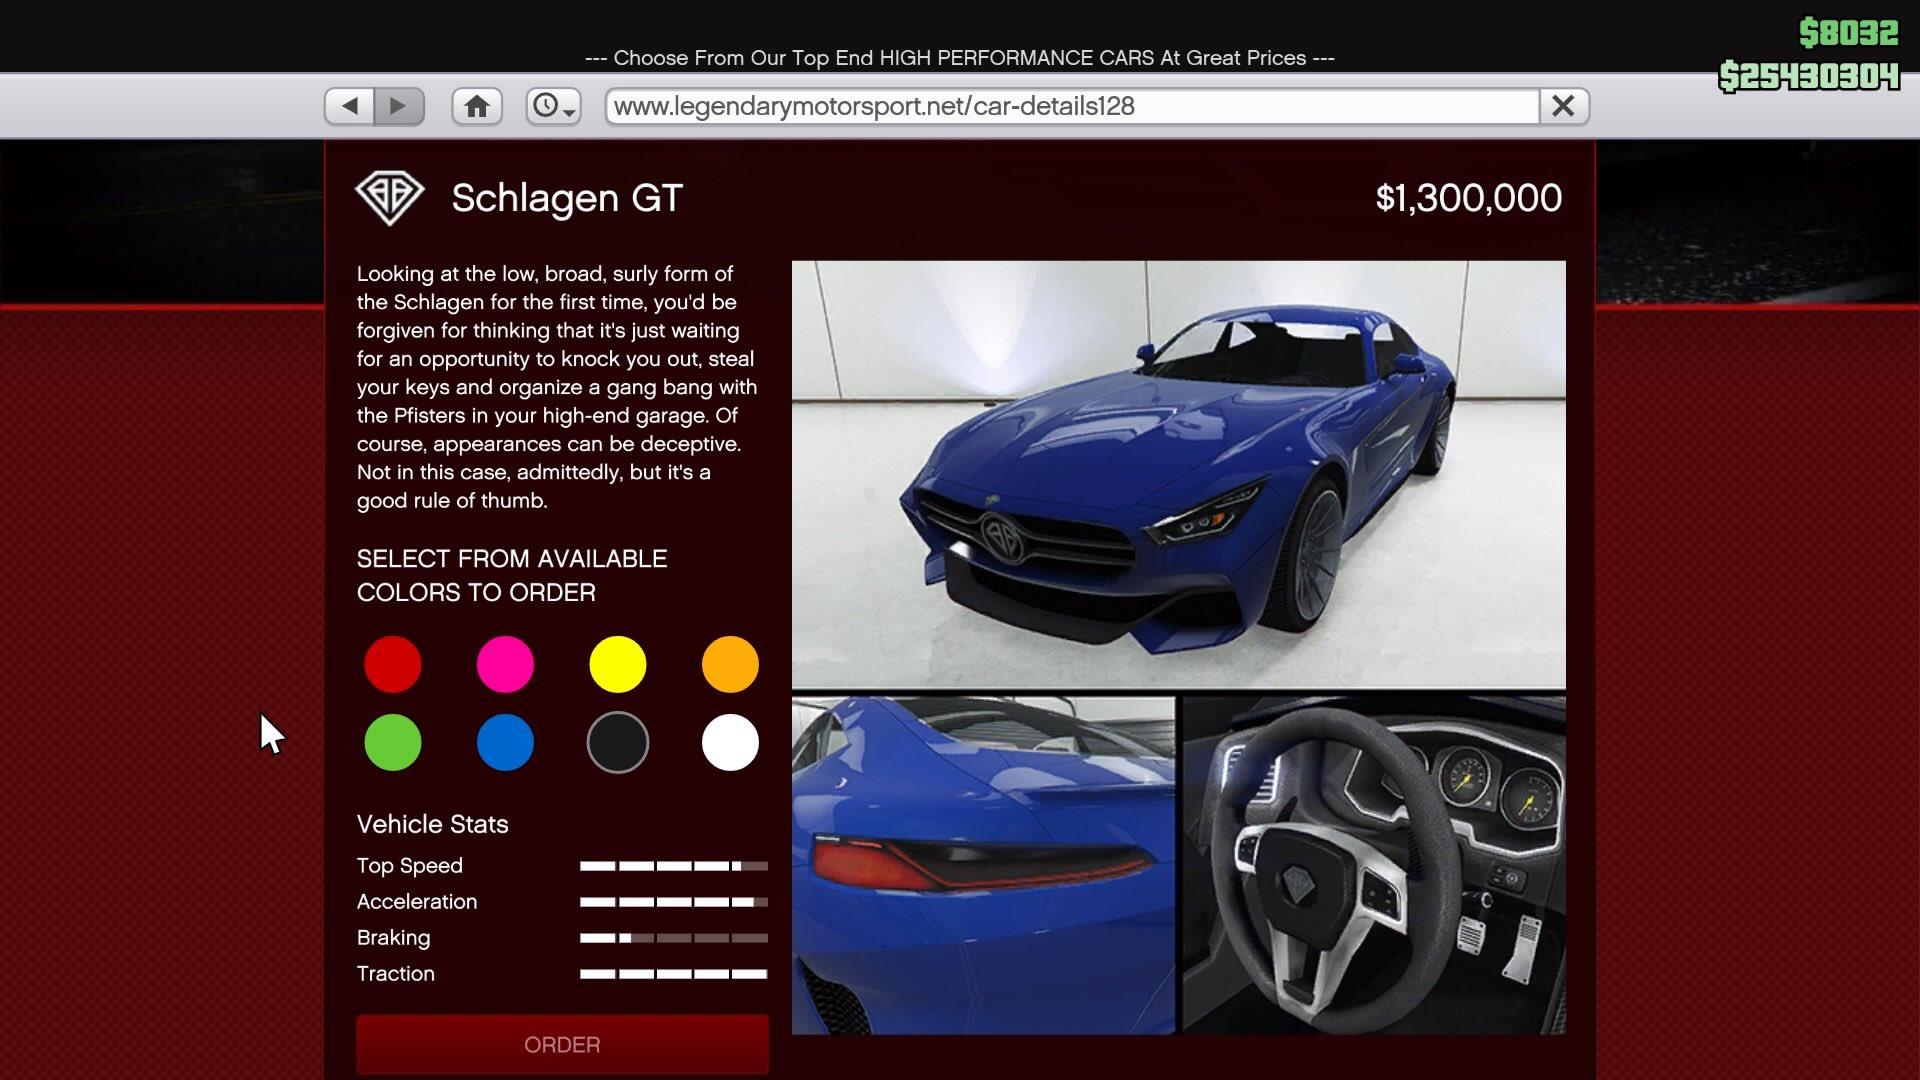 5 Star Auto Sales >> GTA Online: The Benefactor Schlagen GT is now available - RockstarINTEL